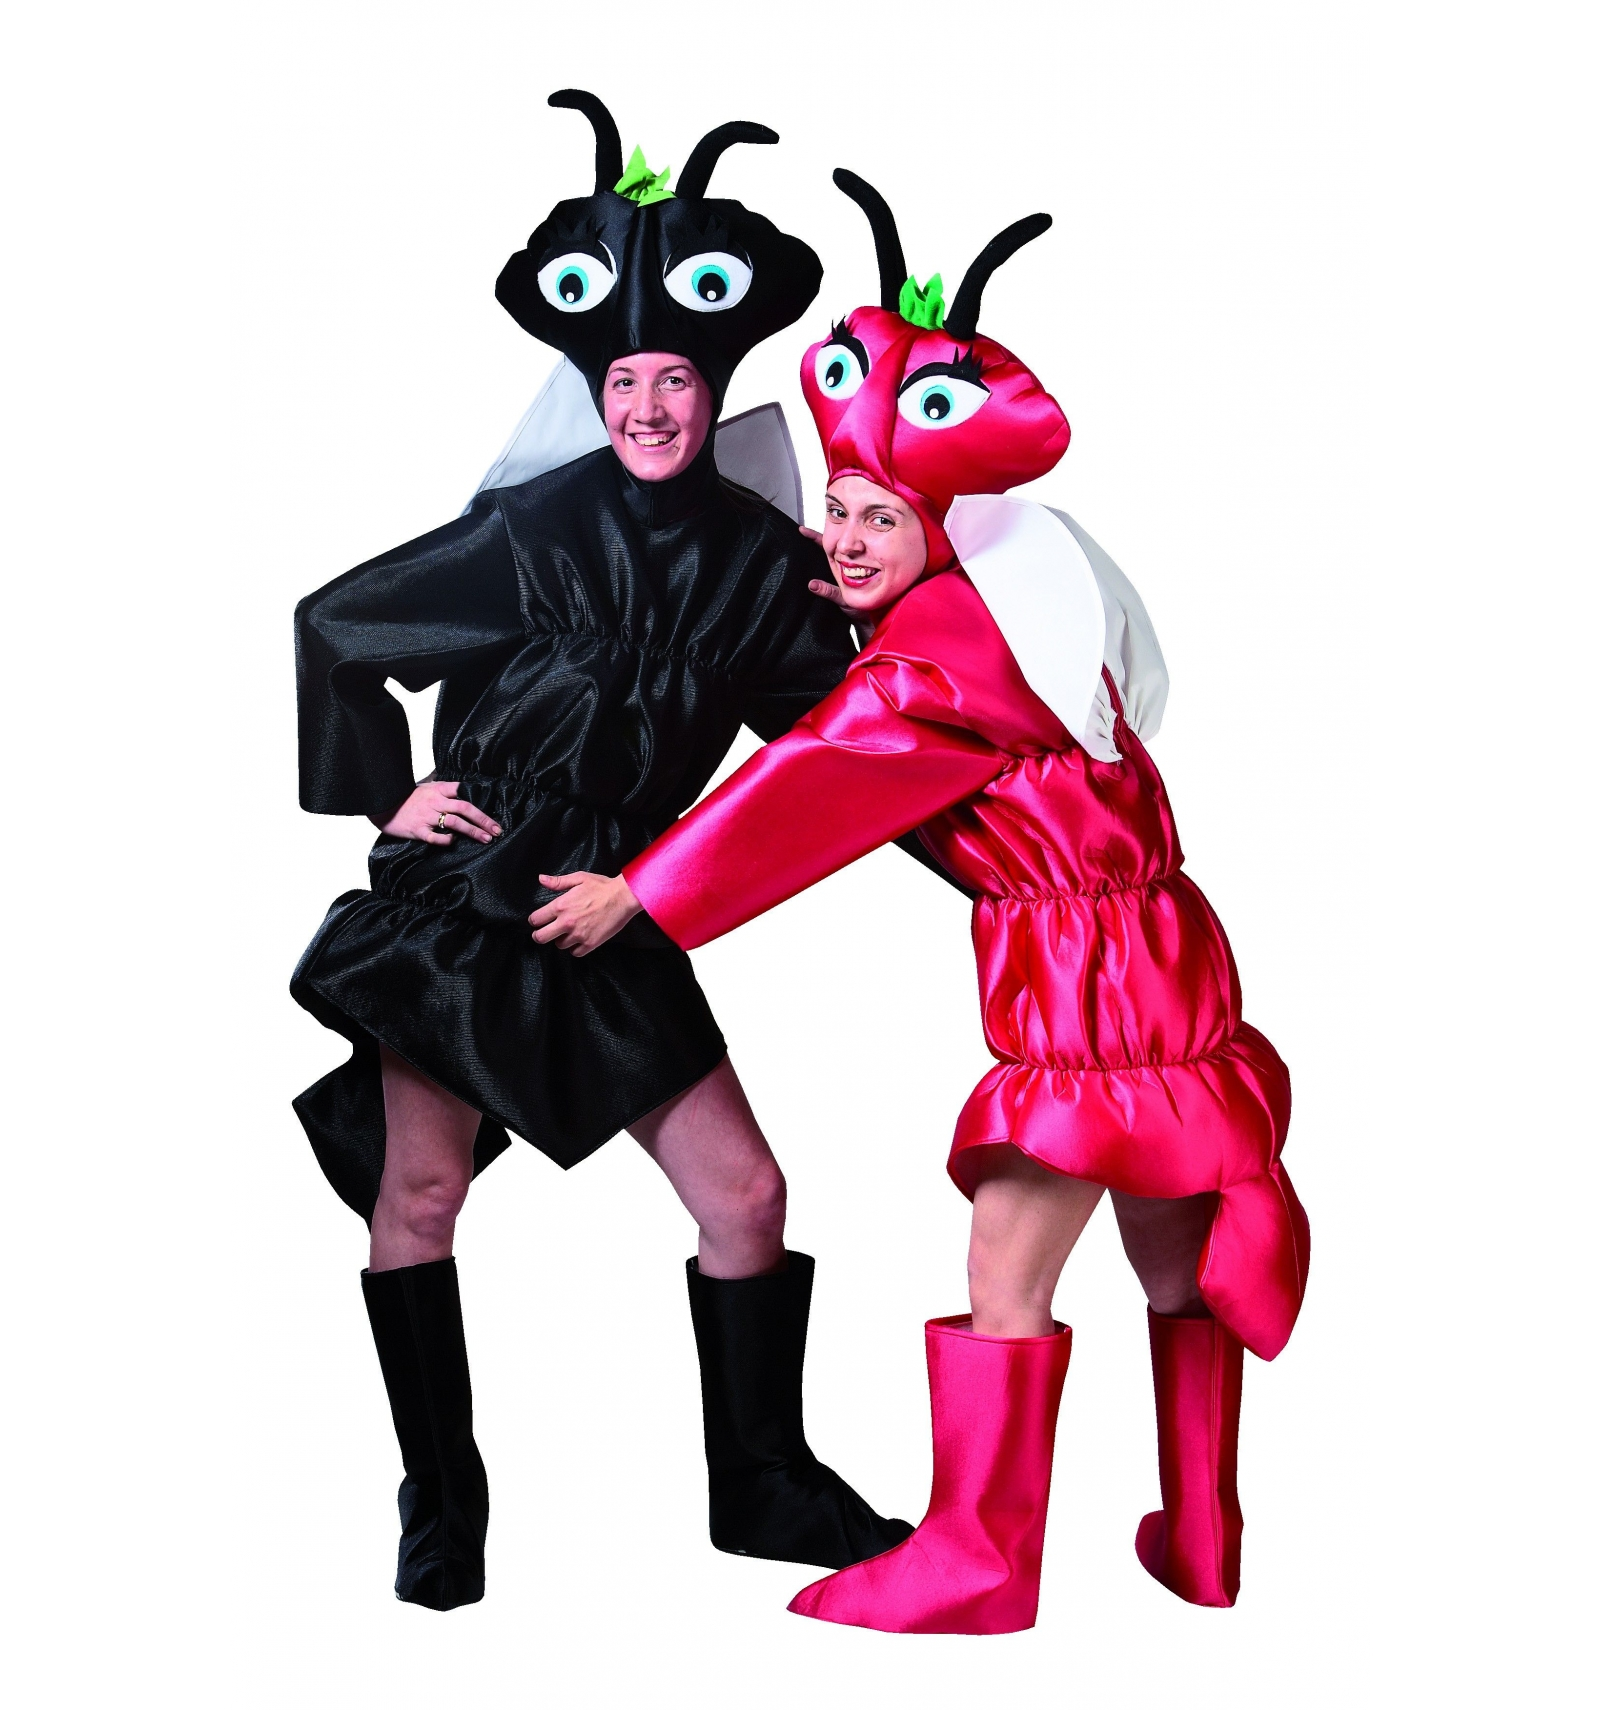 D guisement fourmi rouge - Fourmi rouge et tamanoir ...